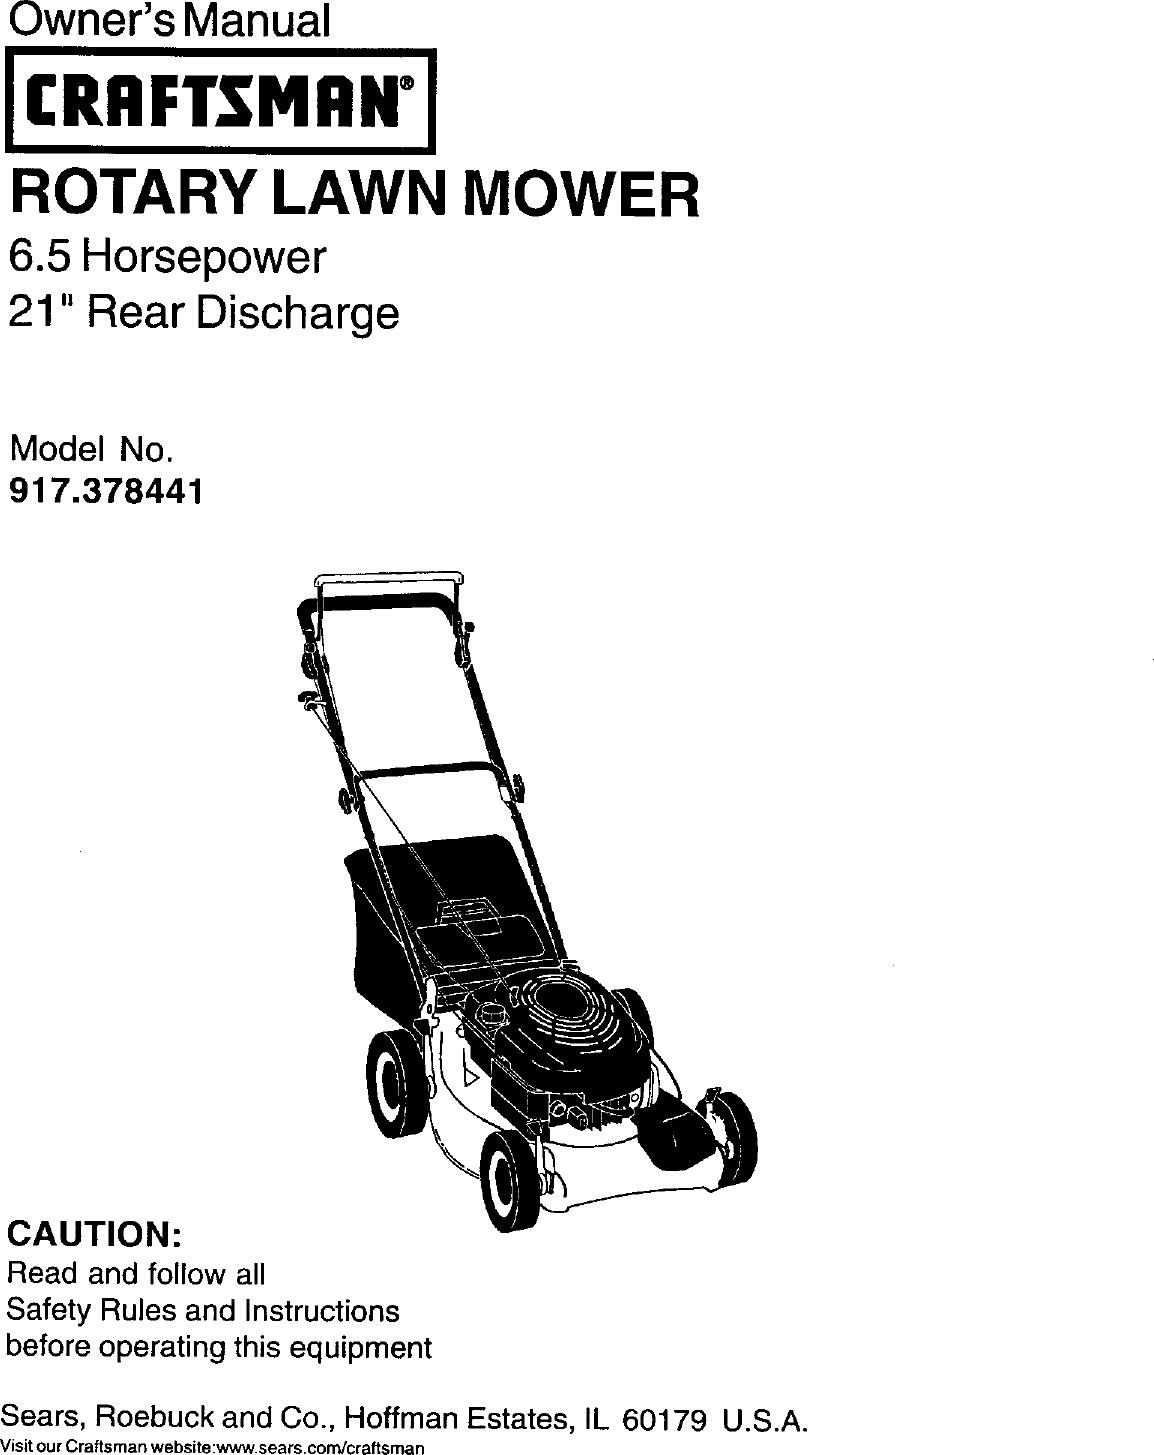 Craftsman 917378441 User Manual Gas, Walk Behind Lawnmower